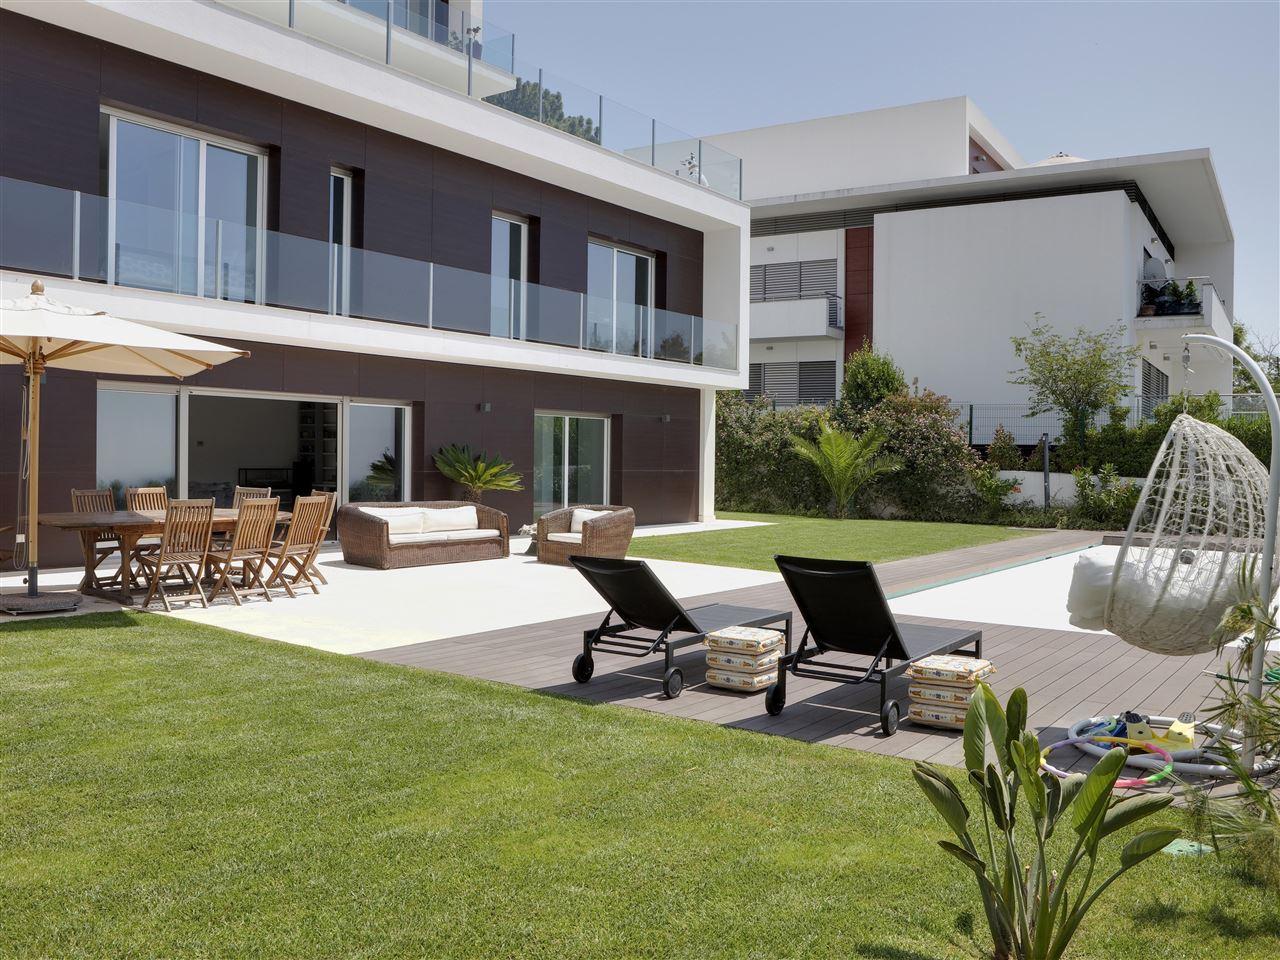 Single Family Homes for Sale at House, 6 bedrooms, for Sale Estoril, Cascais, Lisboa Portugal